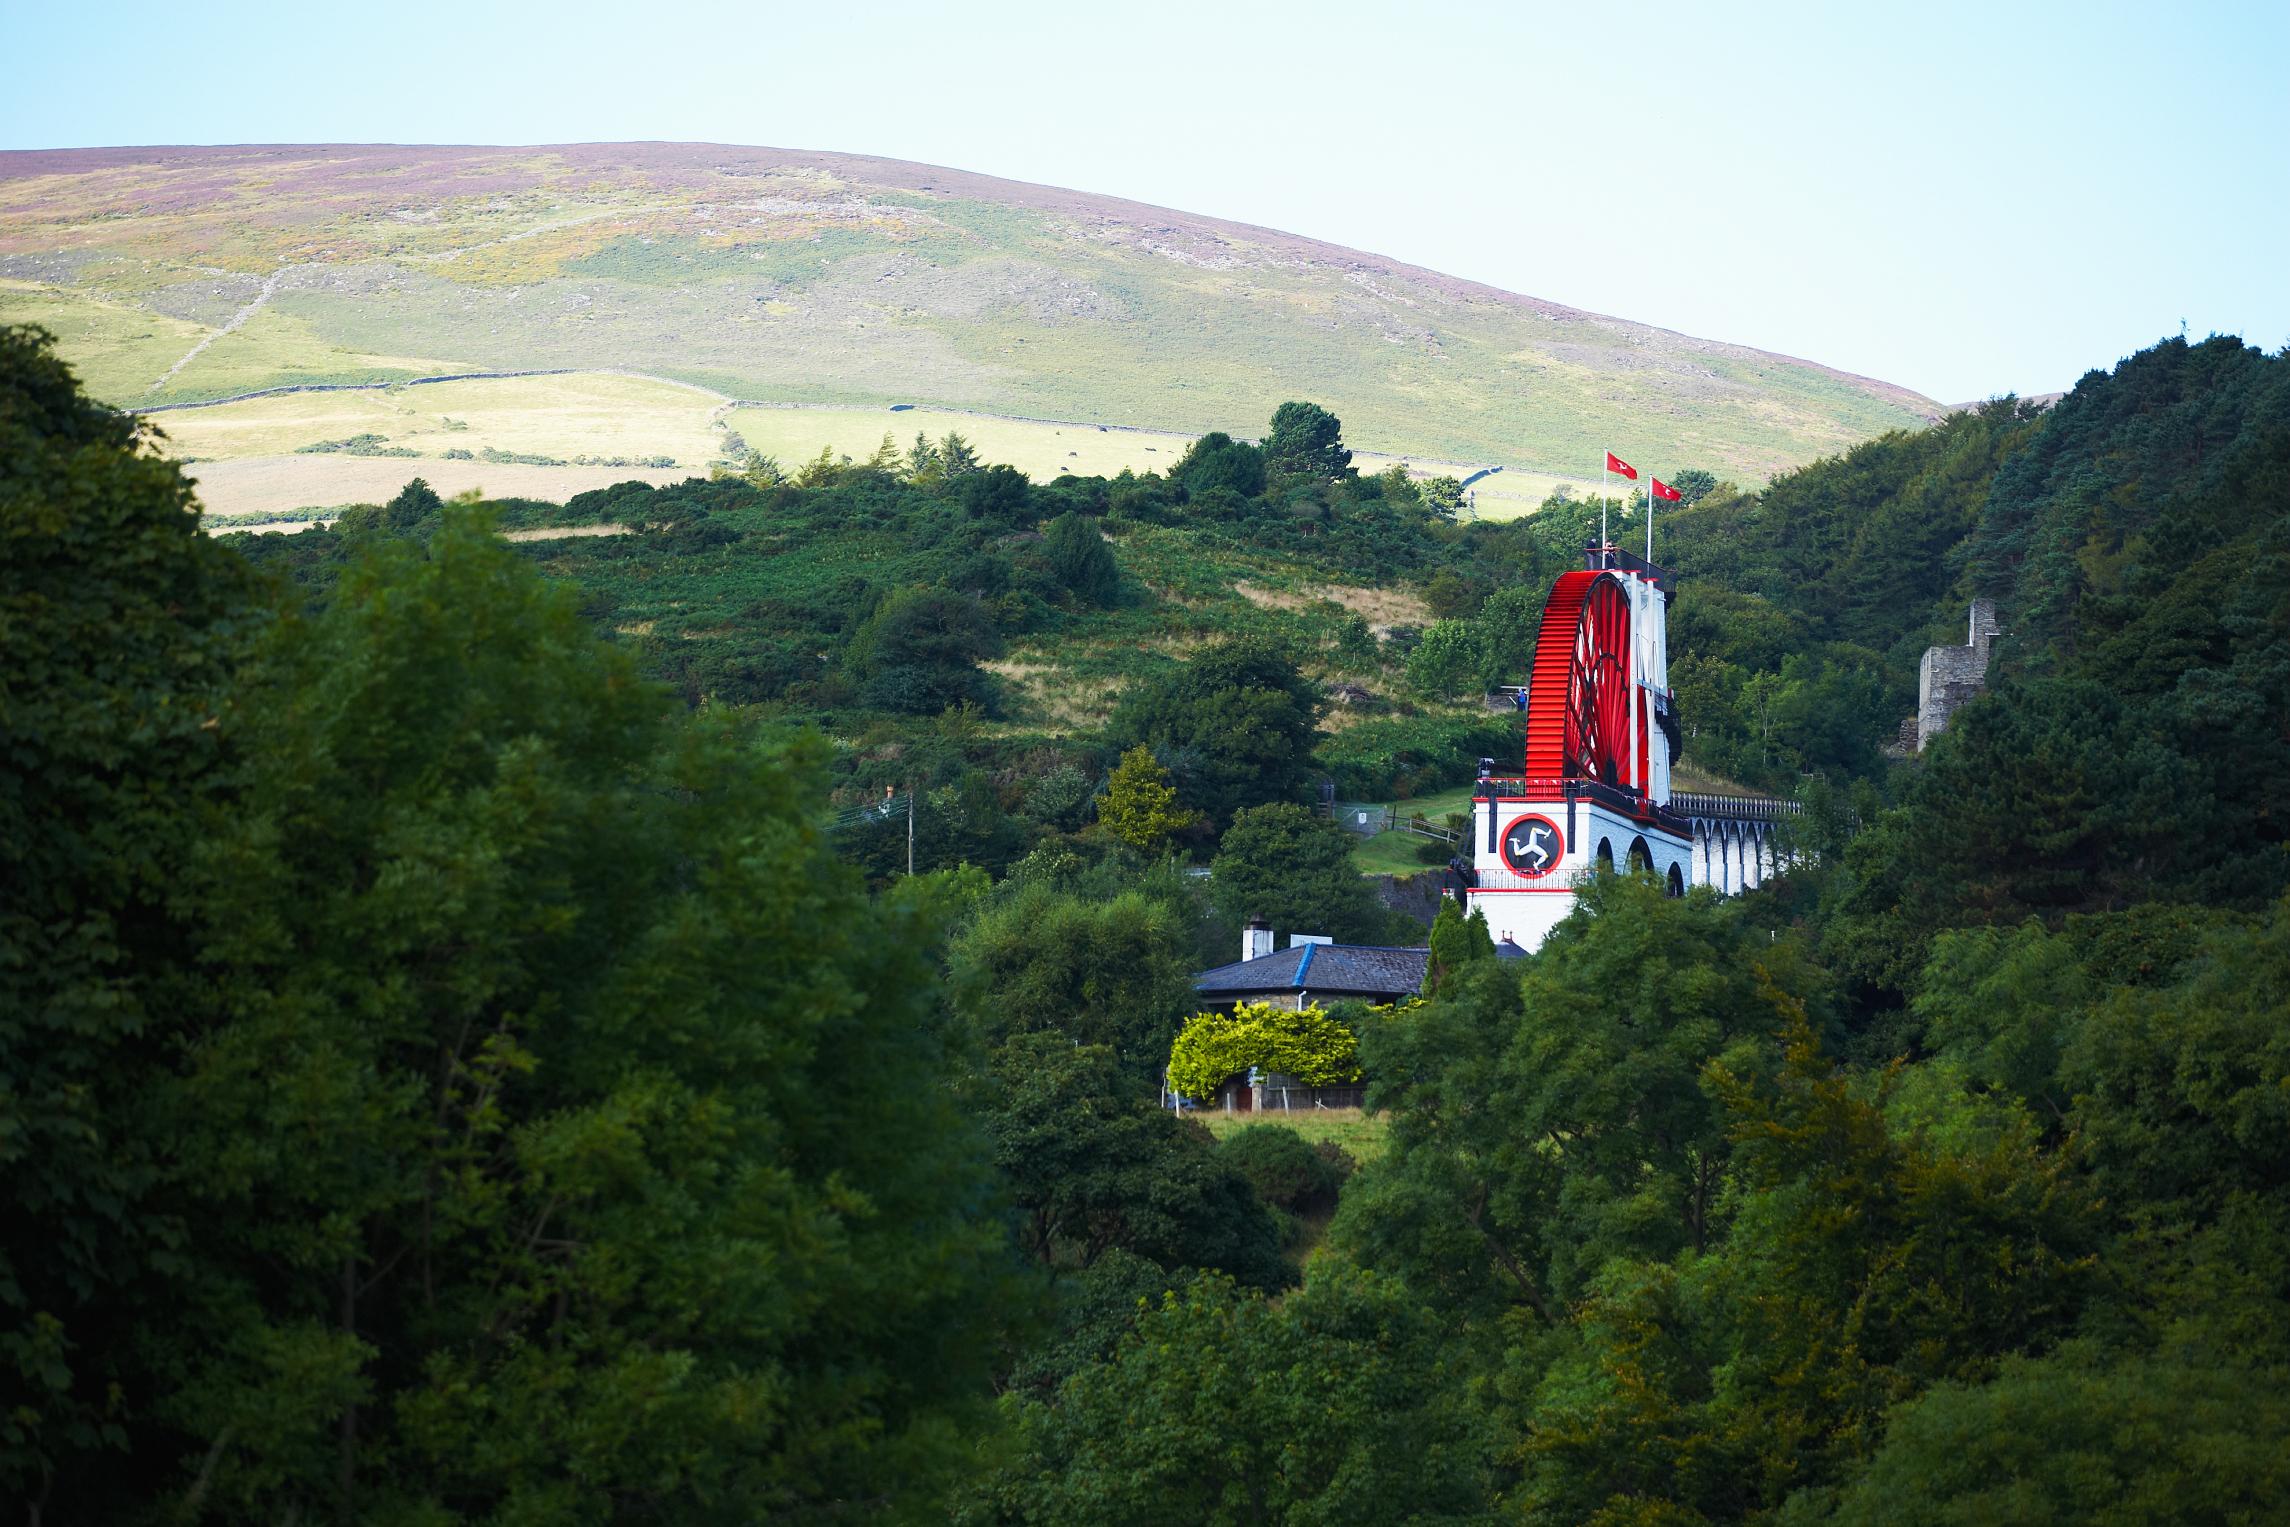 Laxey Wheel, Isle of Man